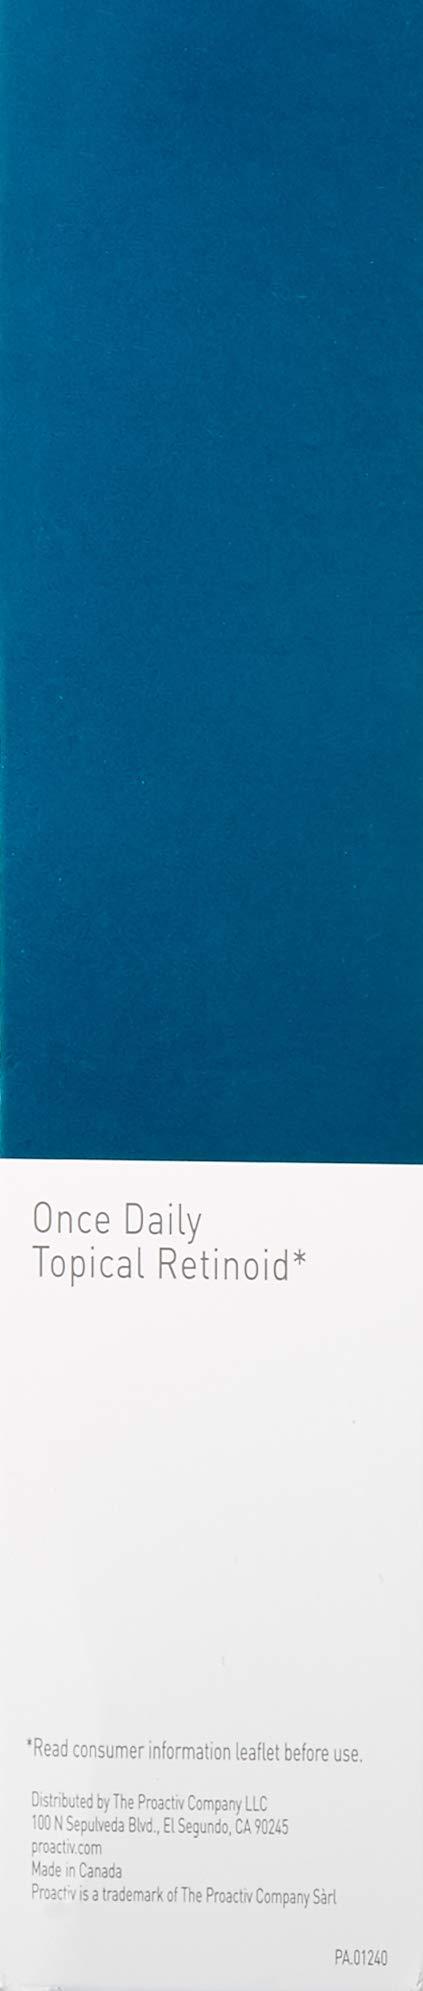 Adapalene Gel, 0.1% Acne Treatment by Proactiv (Image #5)